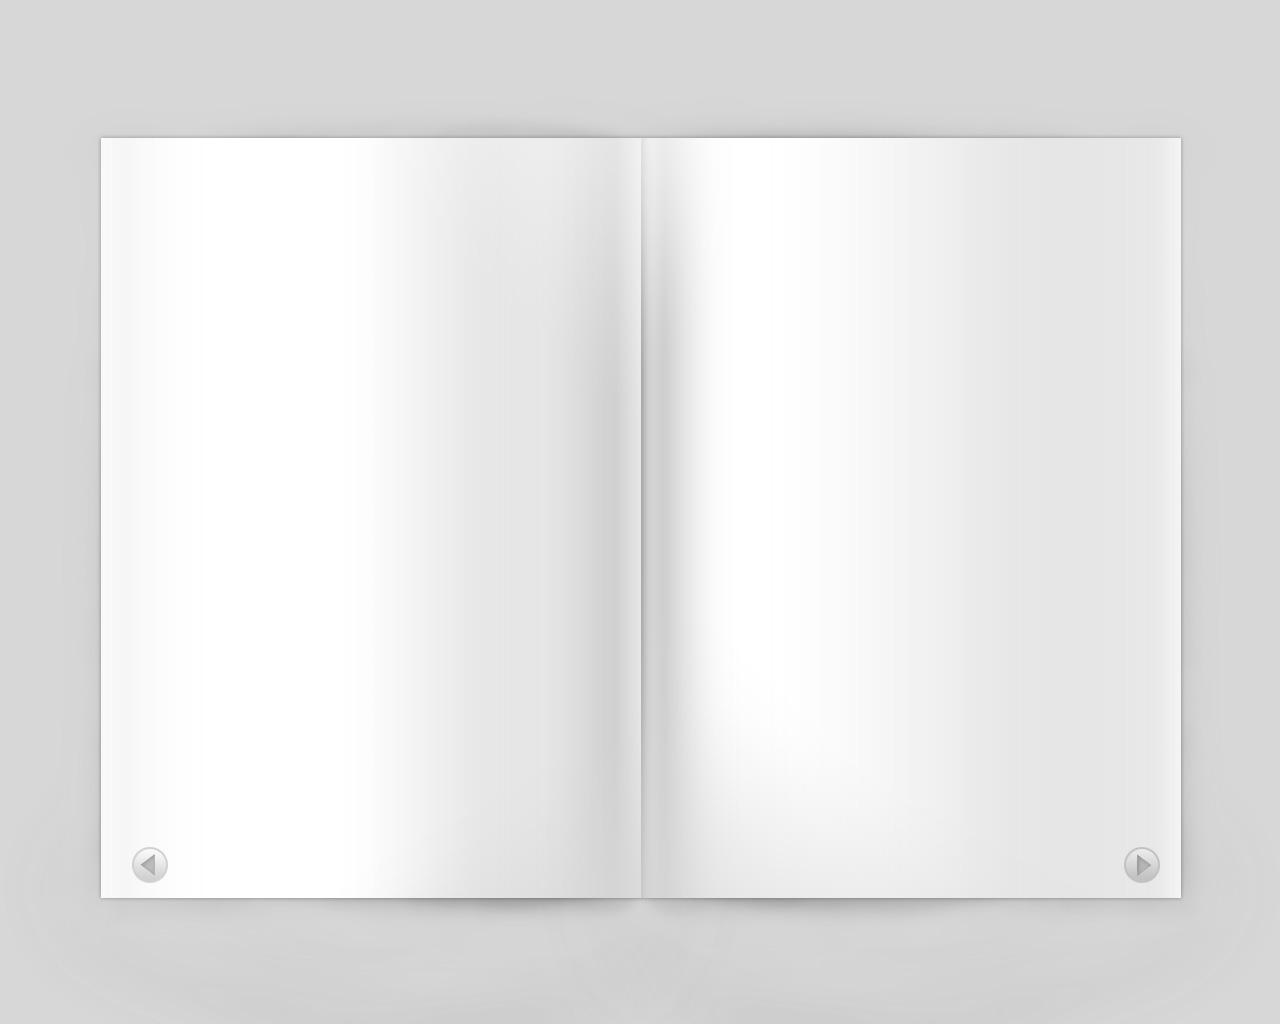 Magazine PSD source file